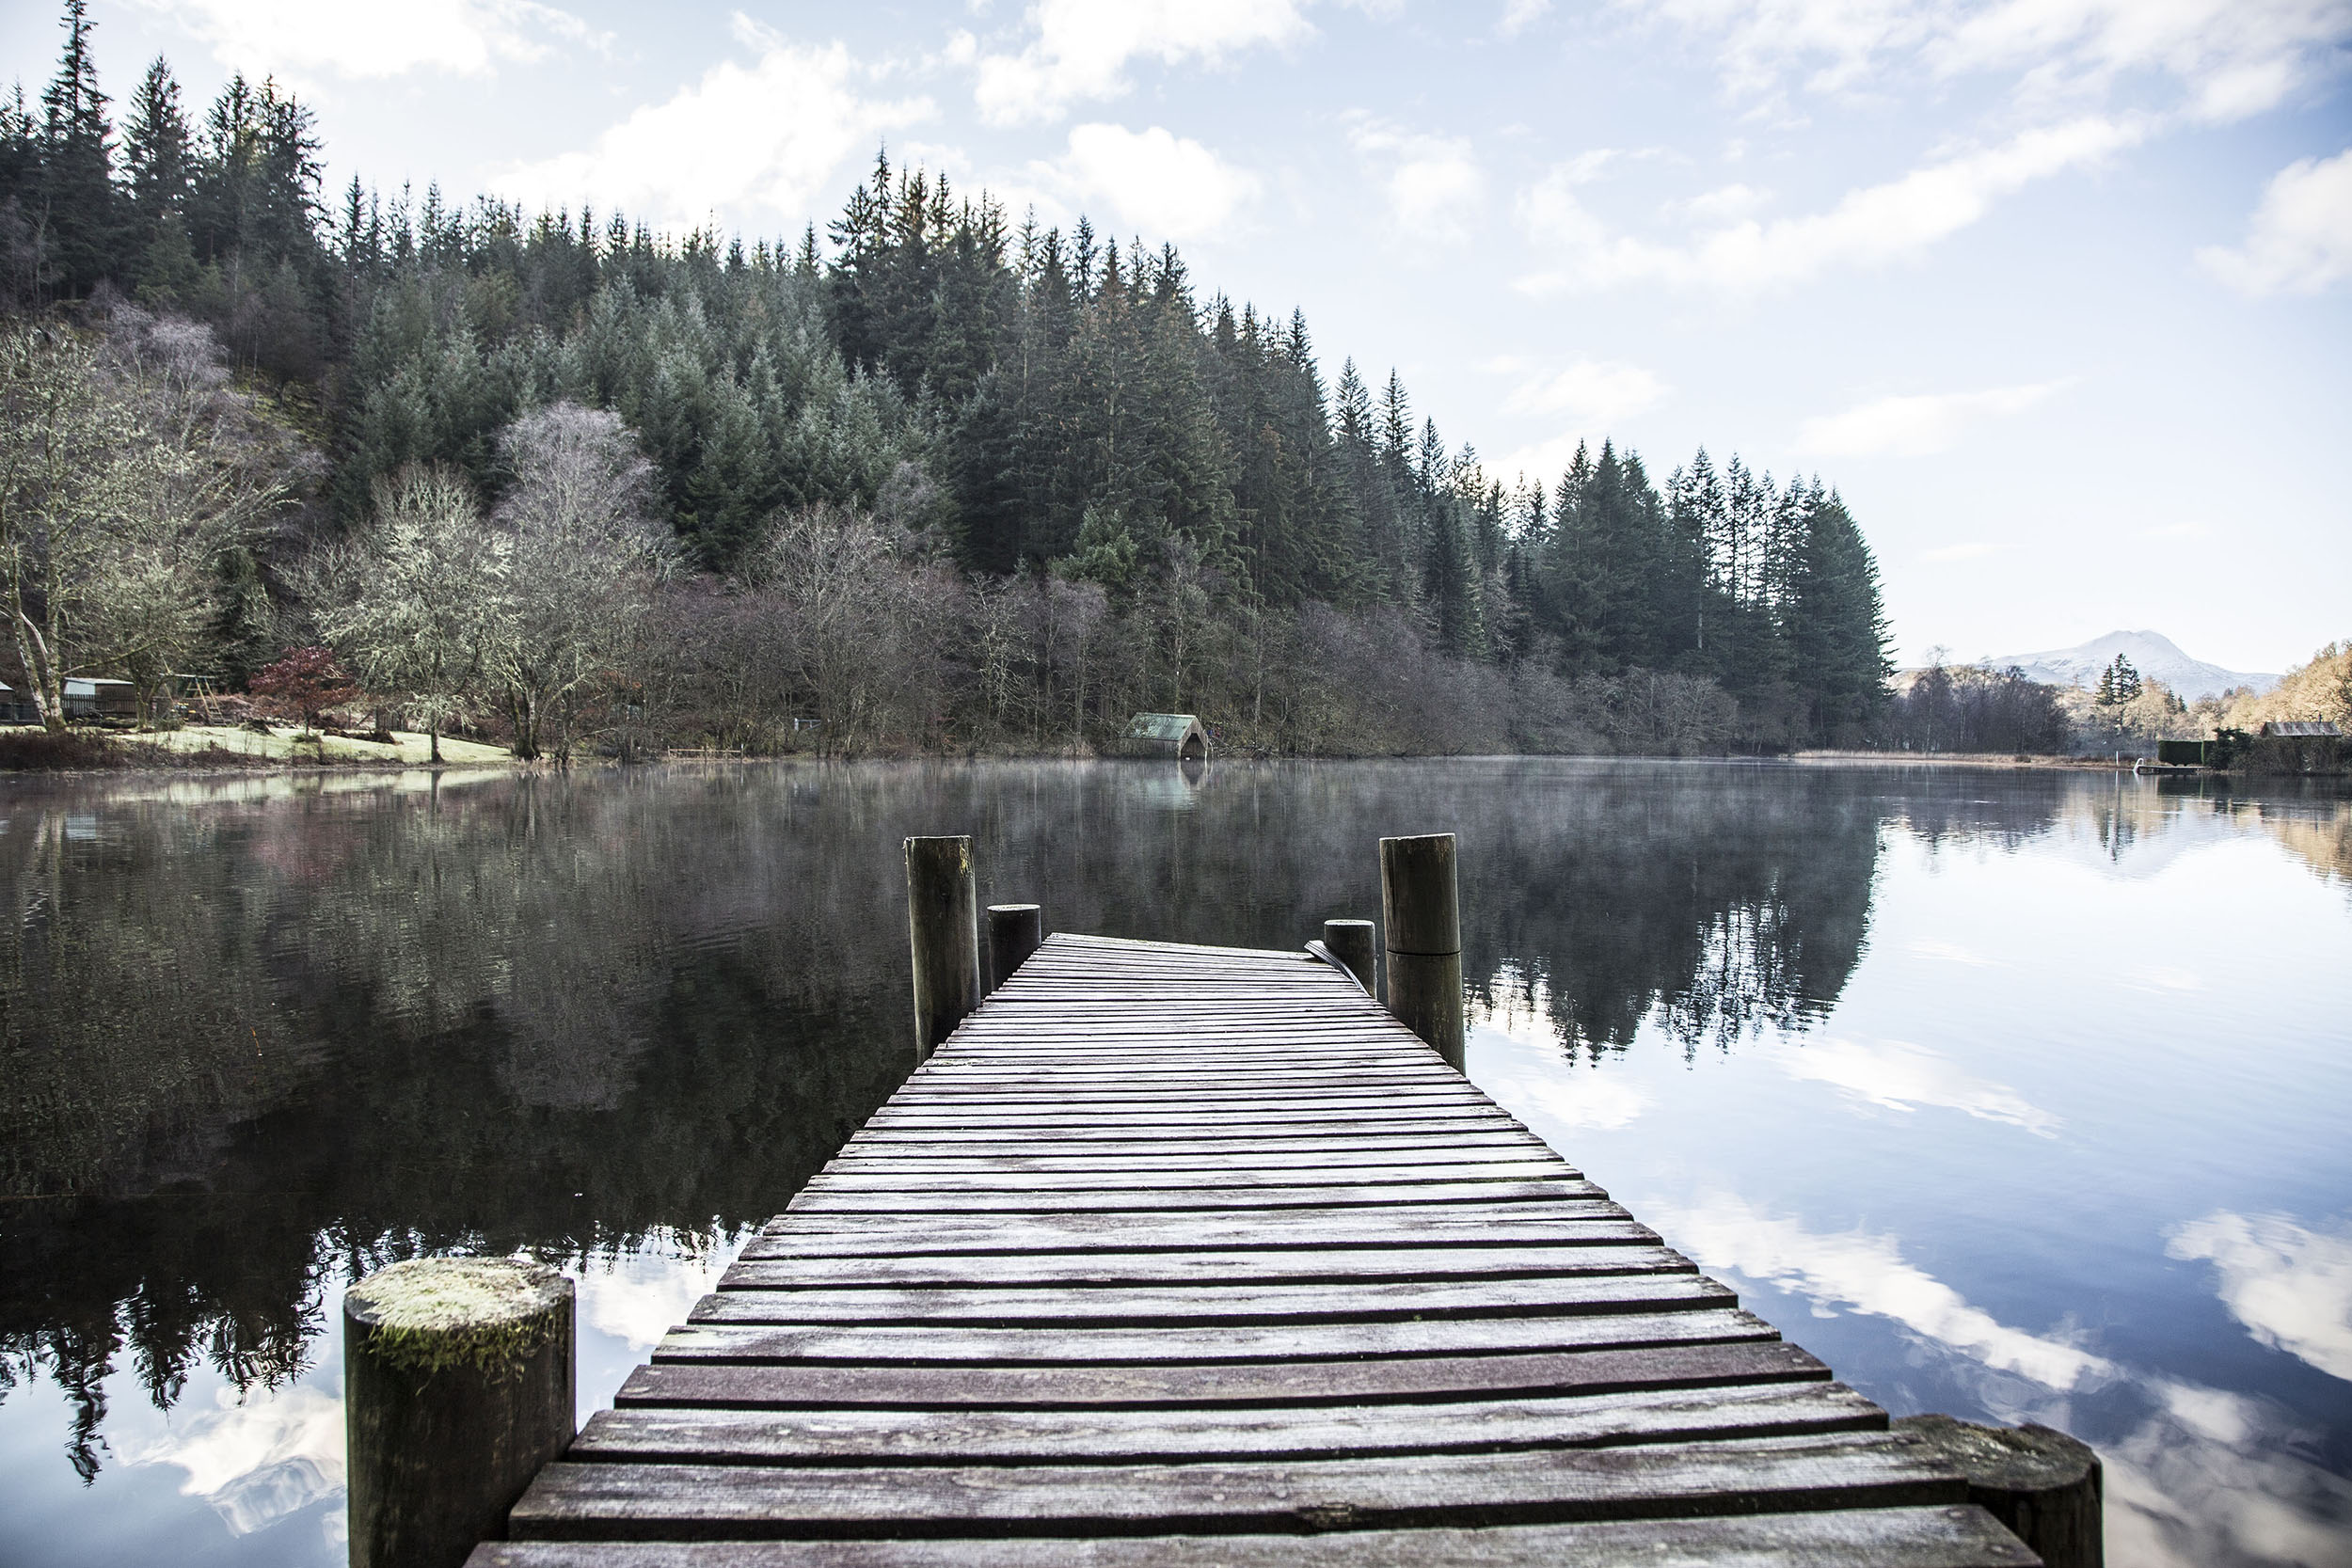 023_IMG_8287_Scotland_Photo_by_Paul_Marc_Mitchell.jpg